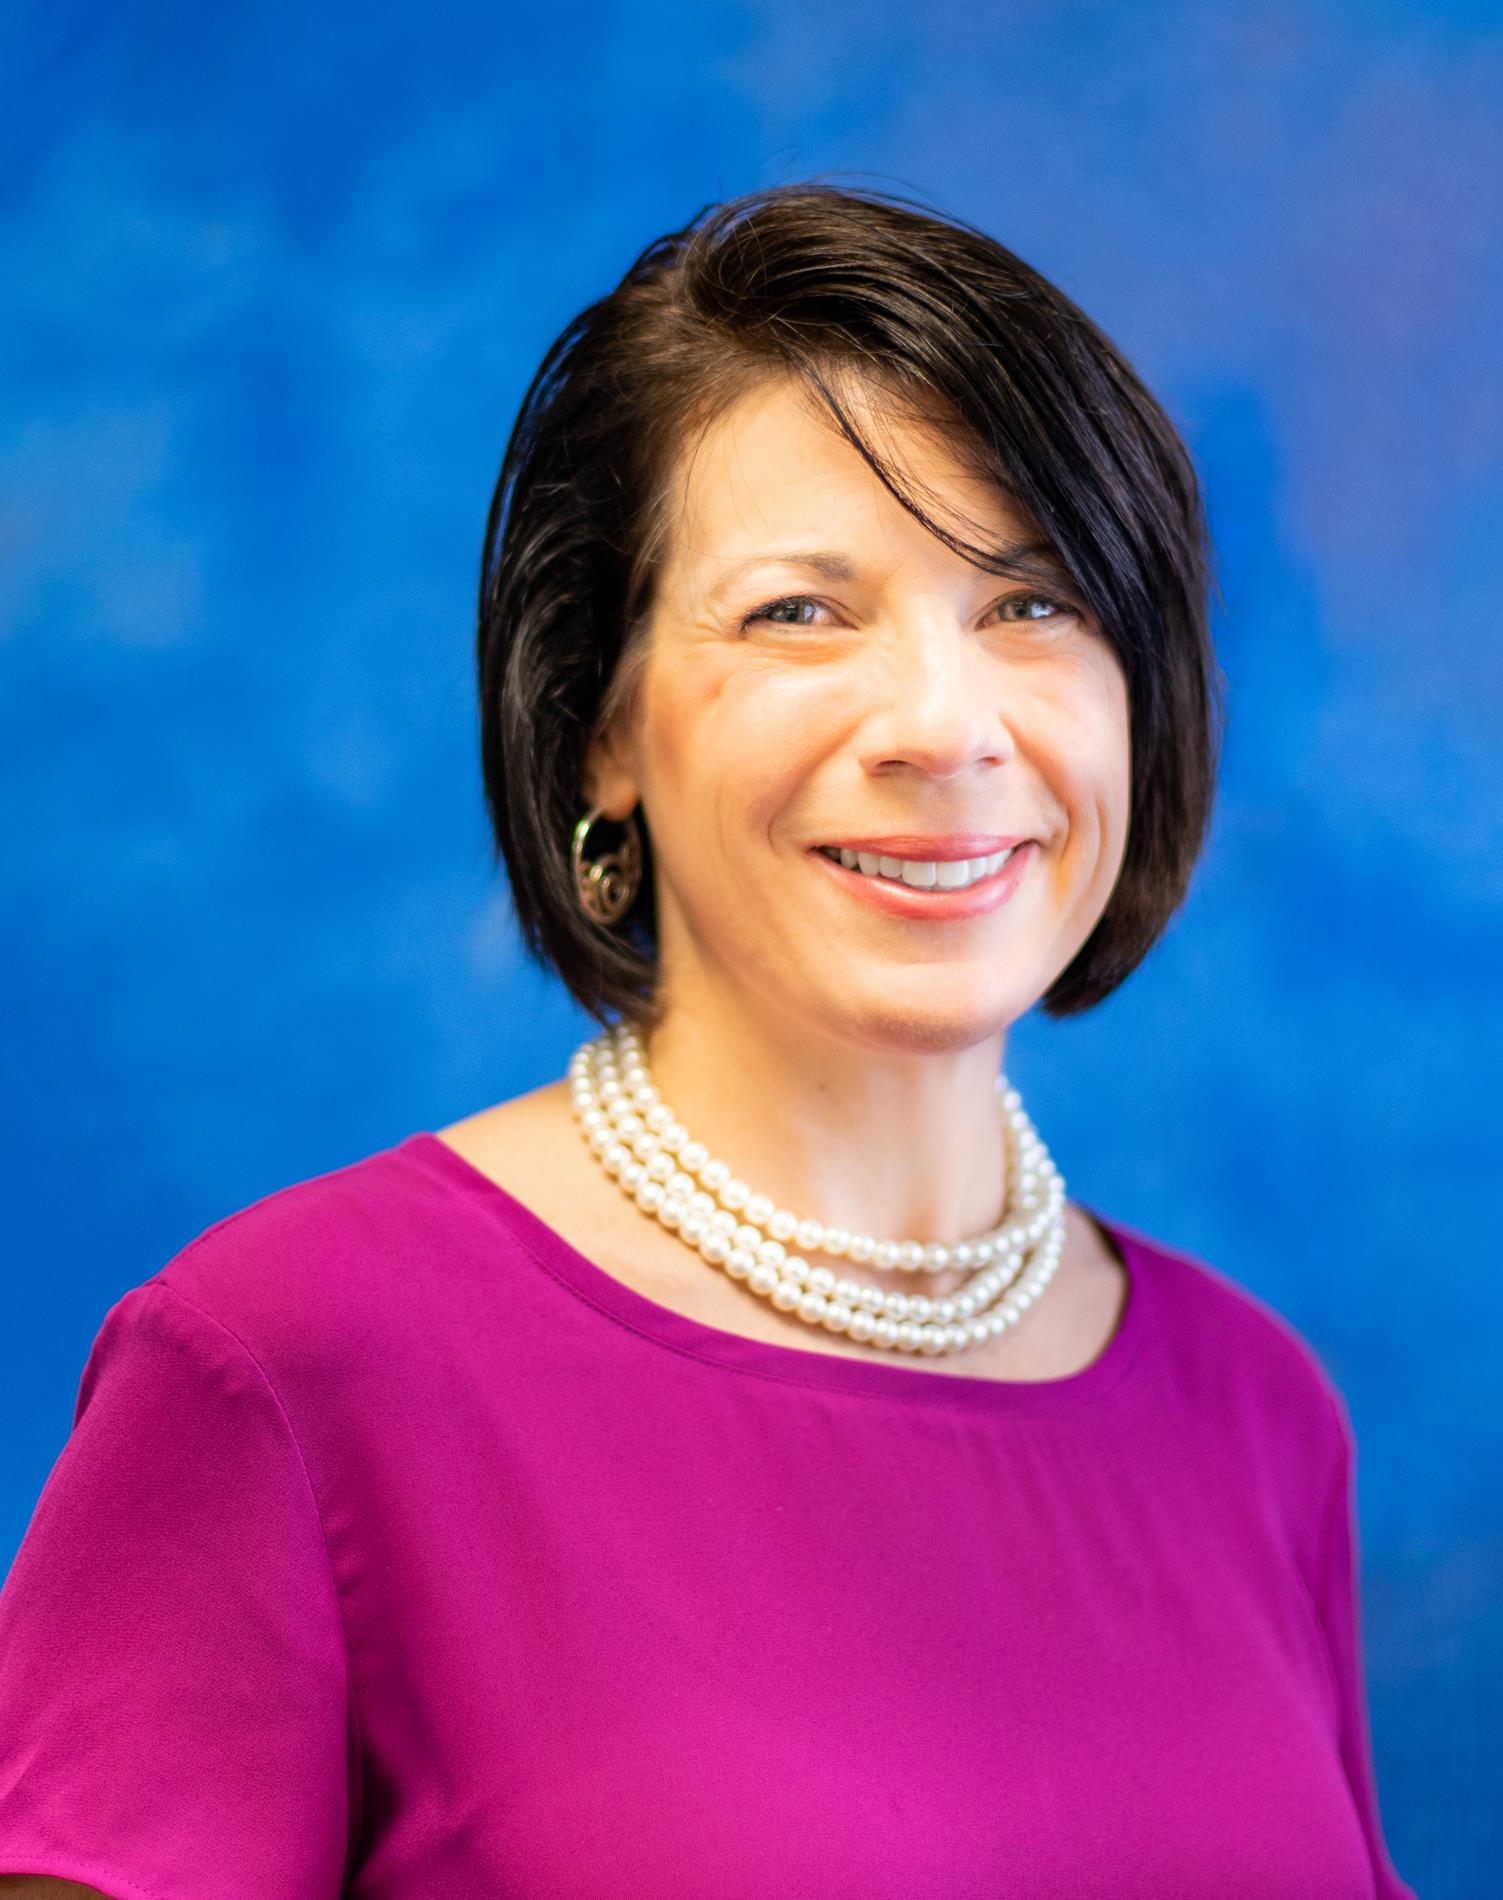 Lori Allen, Director of Early Childhood Programs